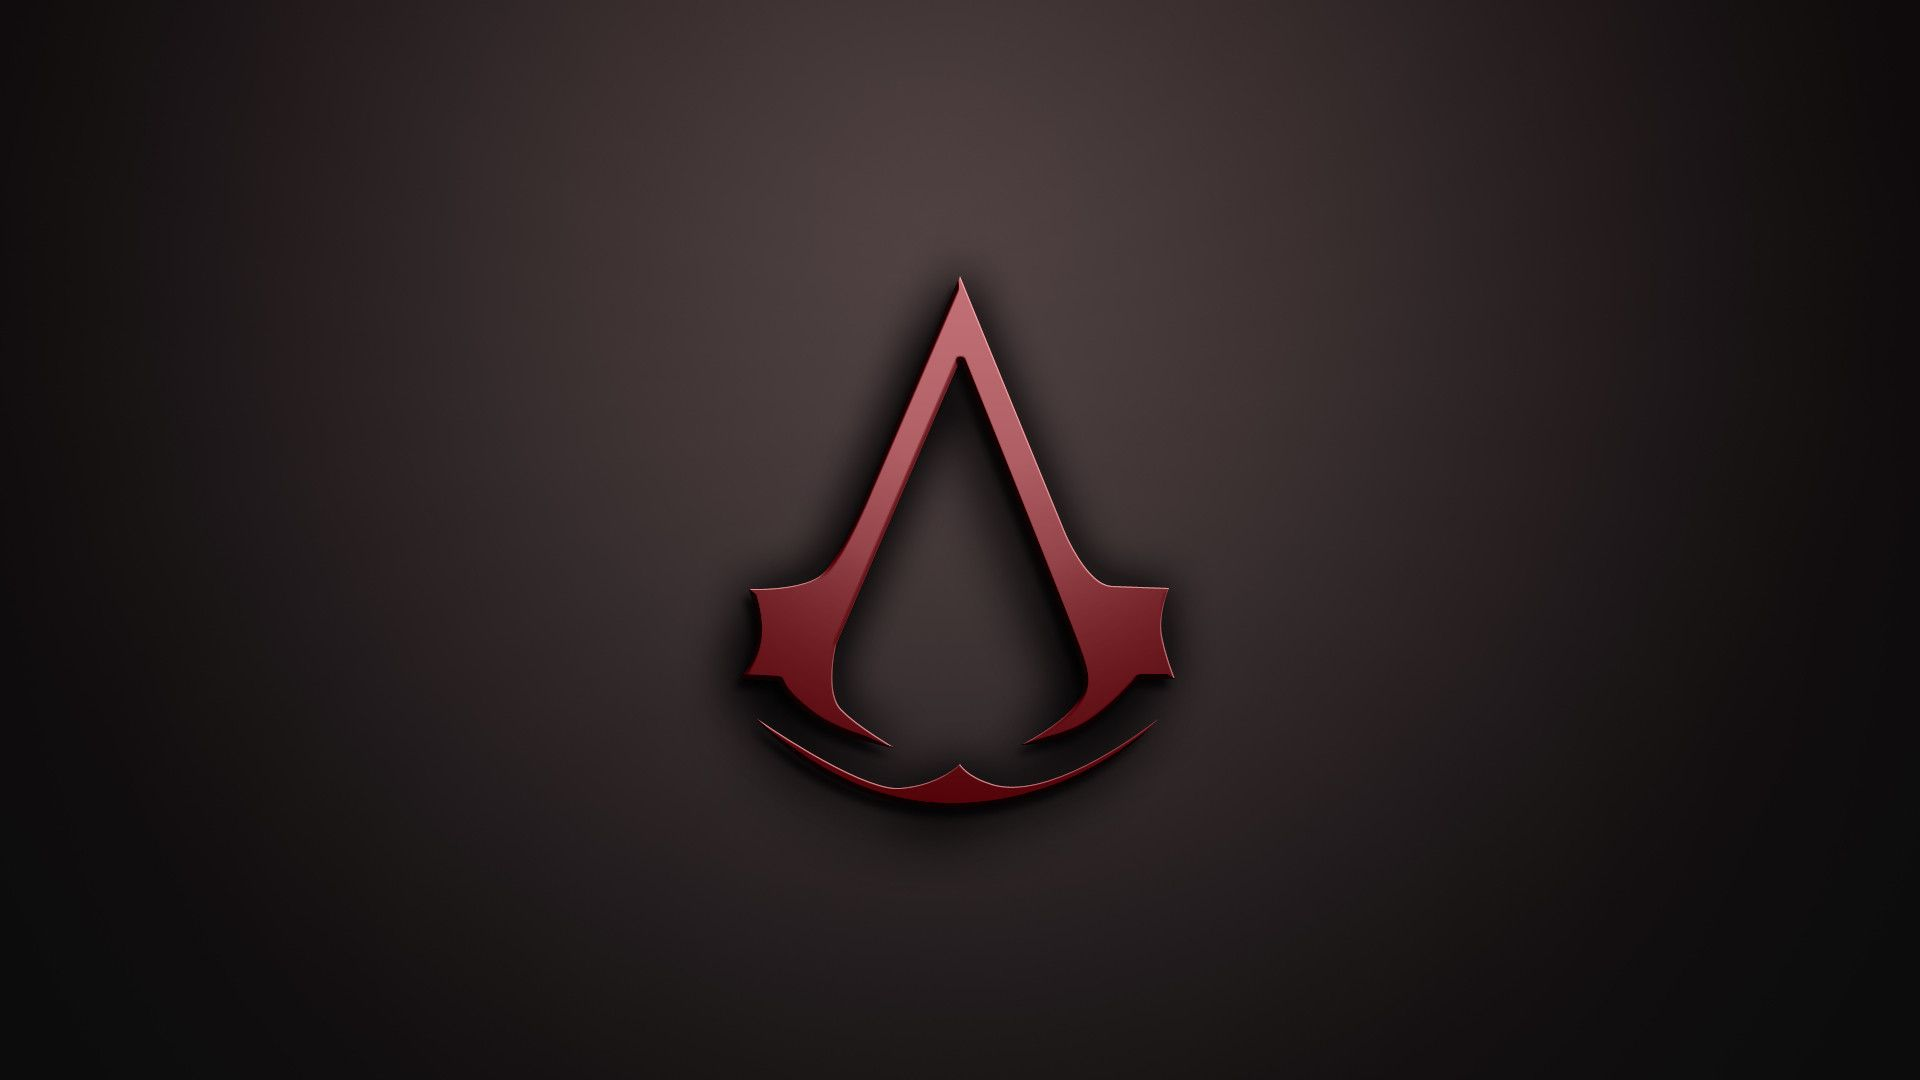 Assassin Symbol Wallpapers Top Free Assassin Symbol